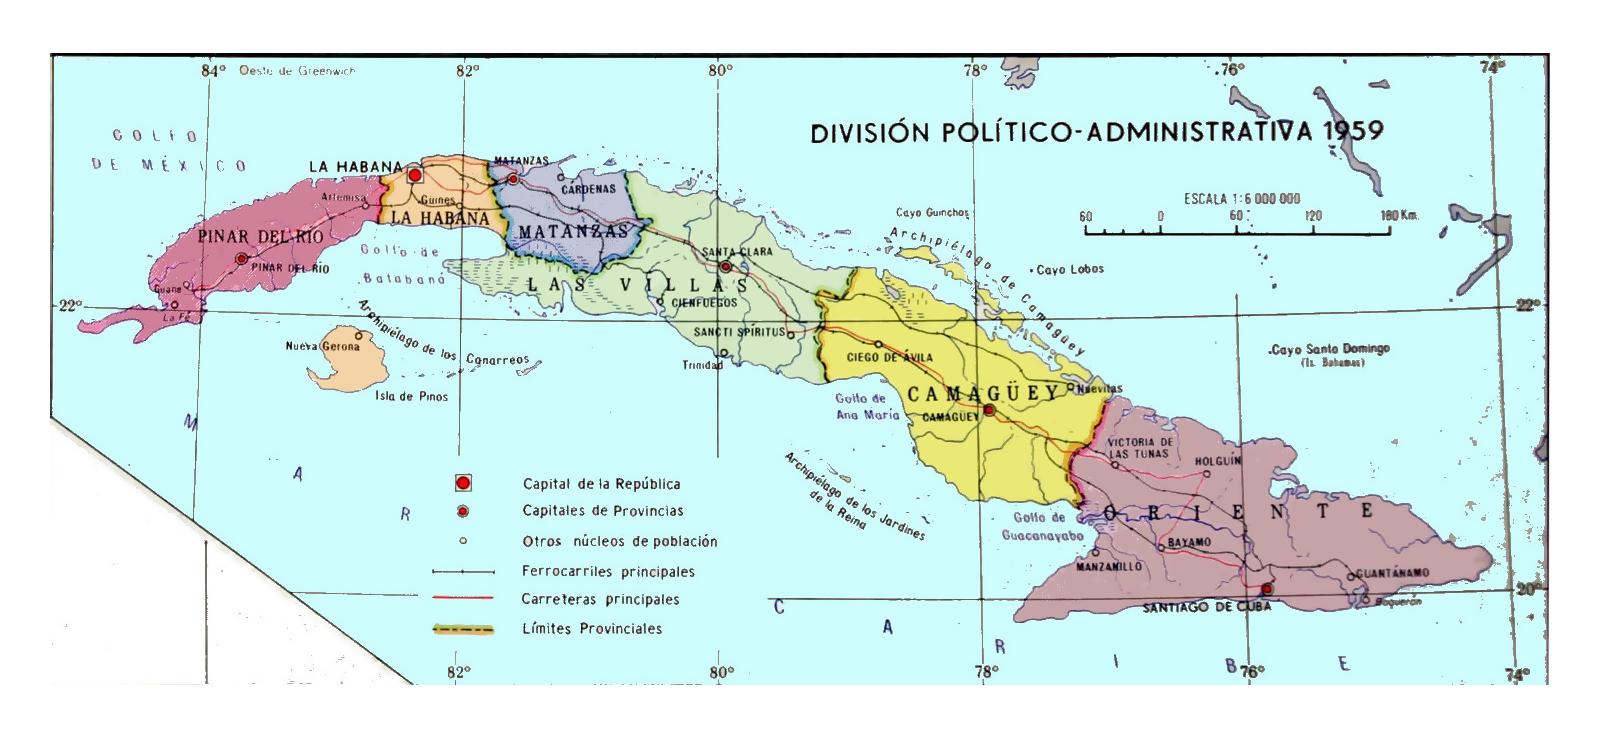 Detailed administrative map of Cuba - 1959 | Cuba | North ...